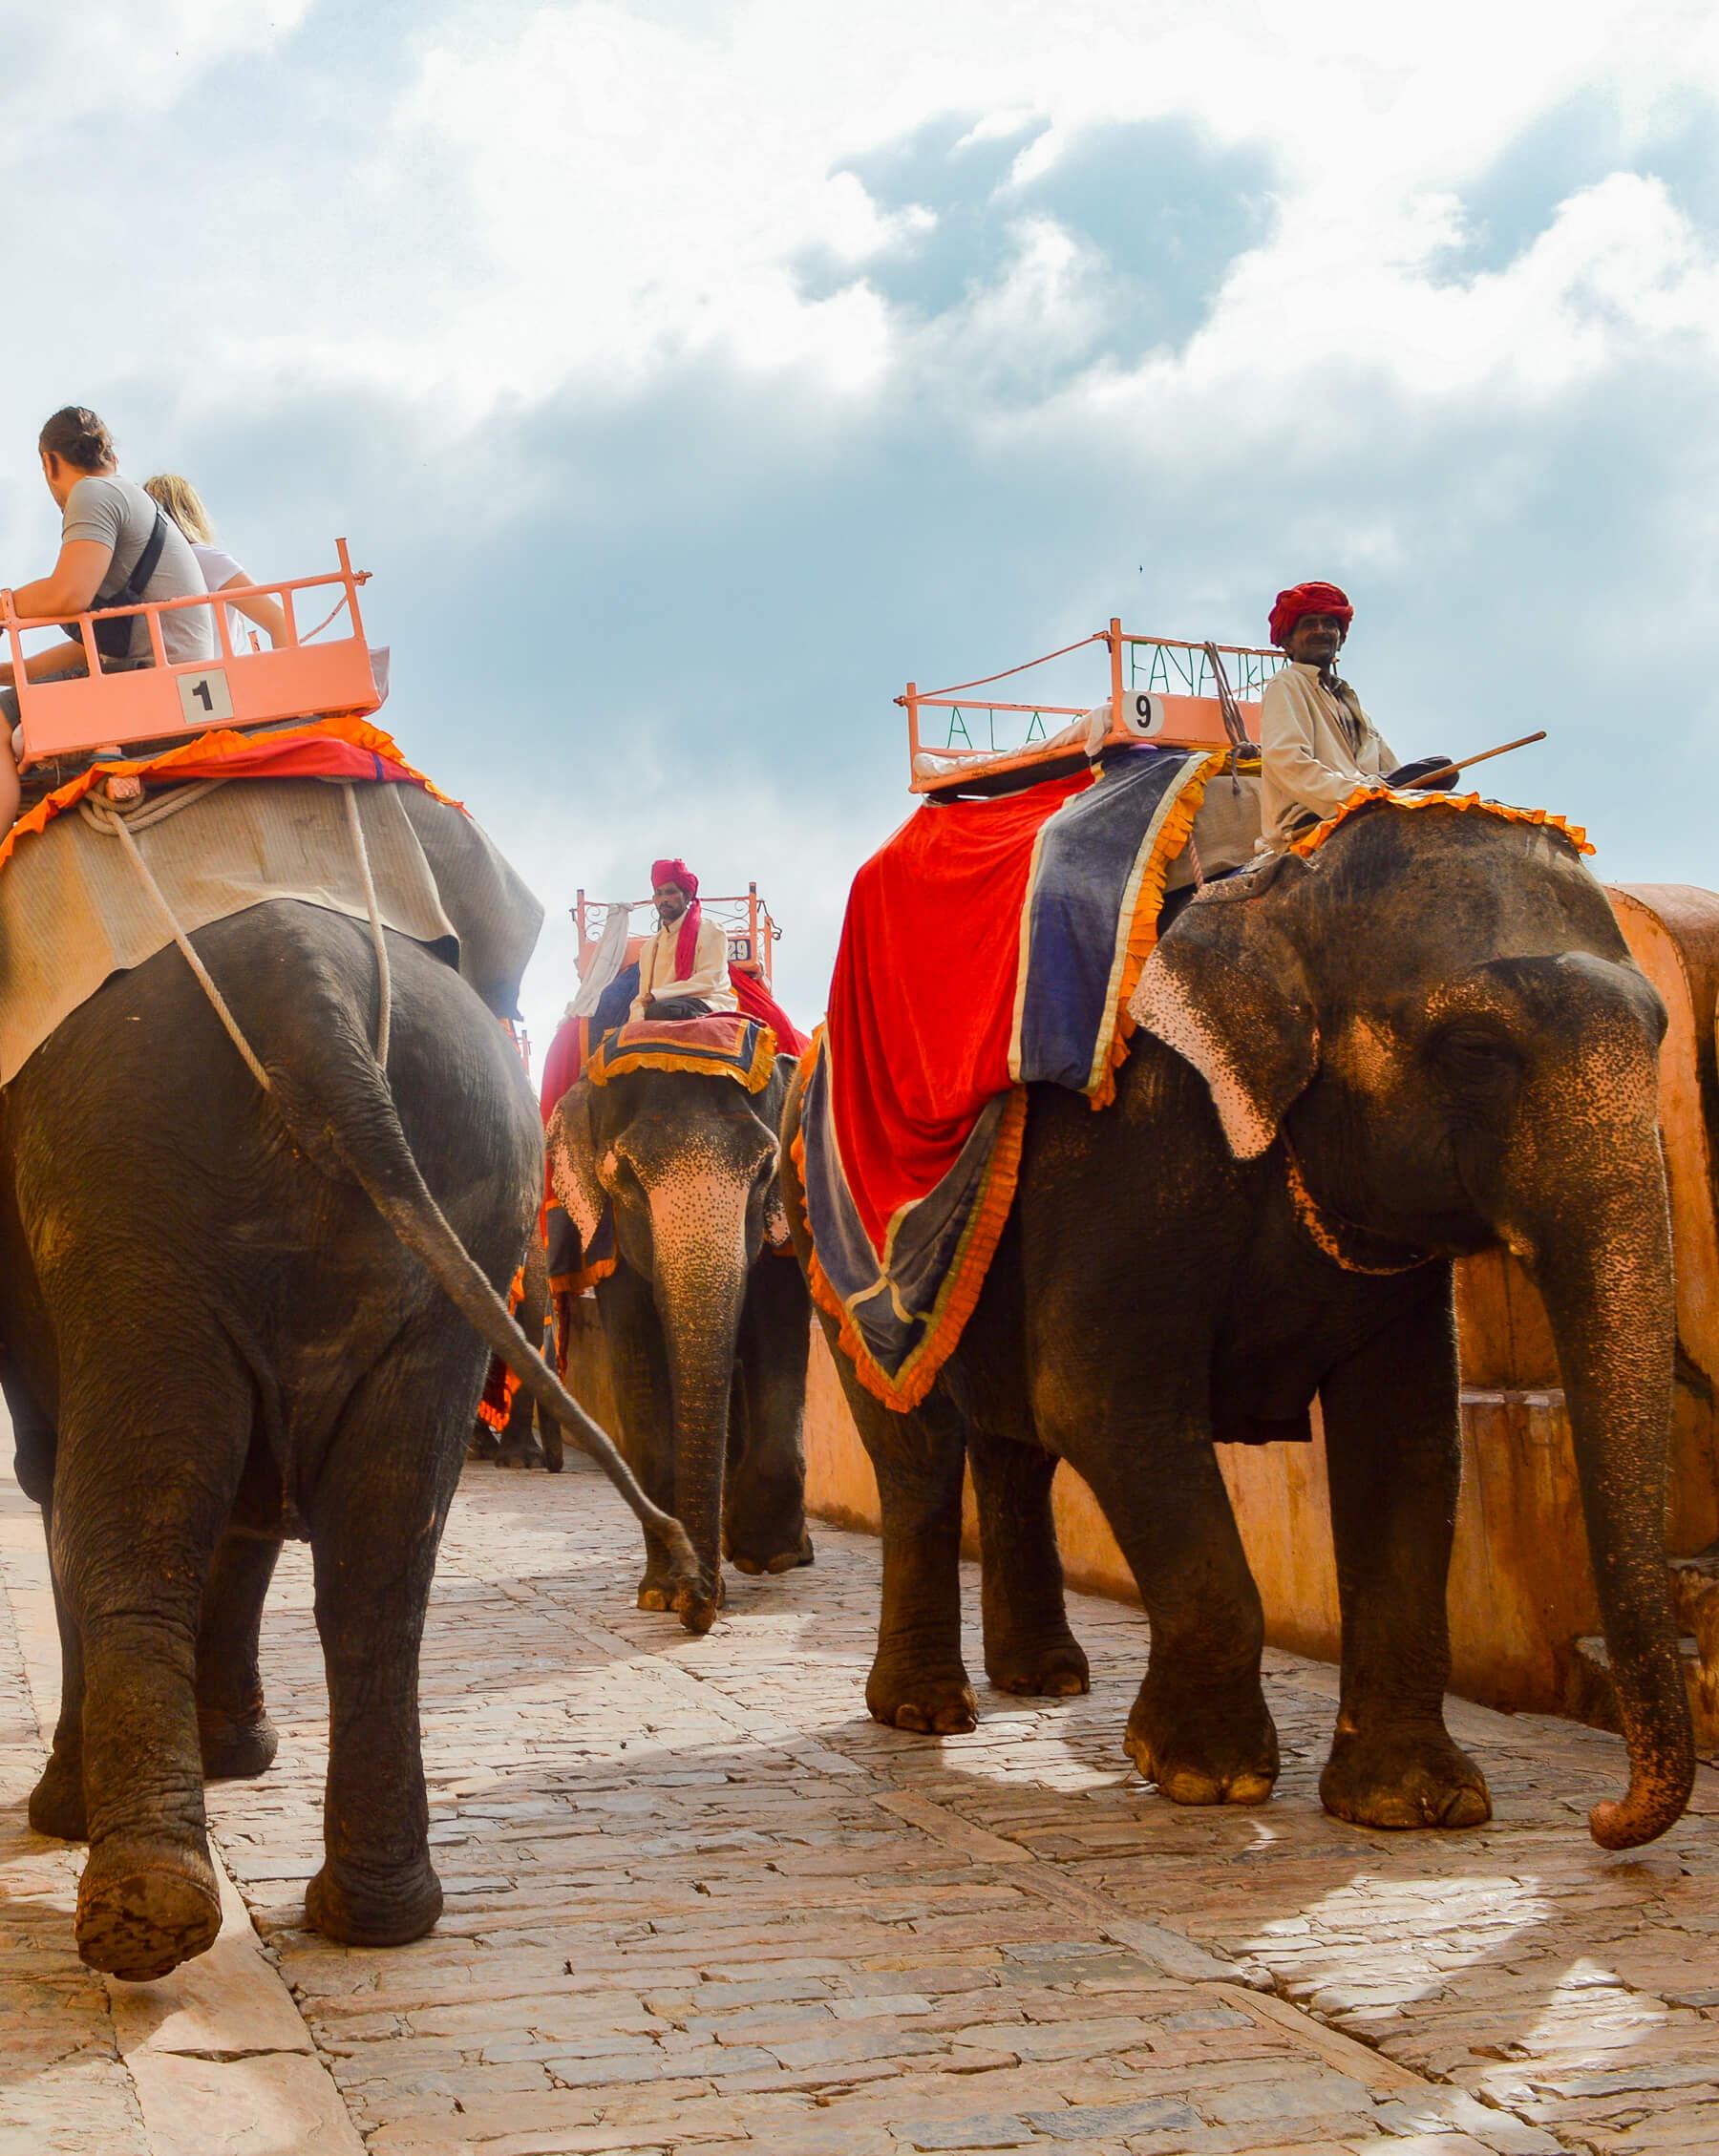 3 elephants walking down from fort